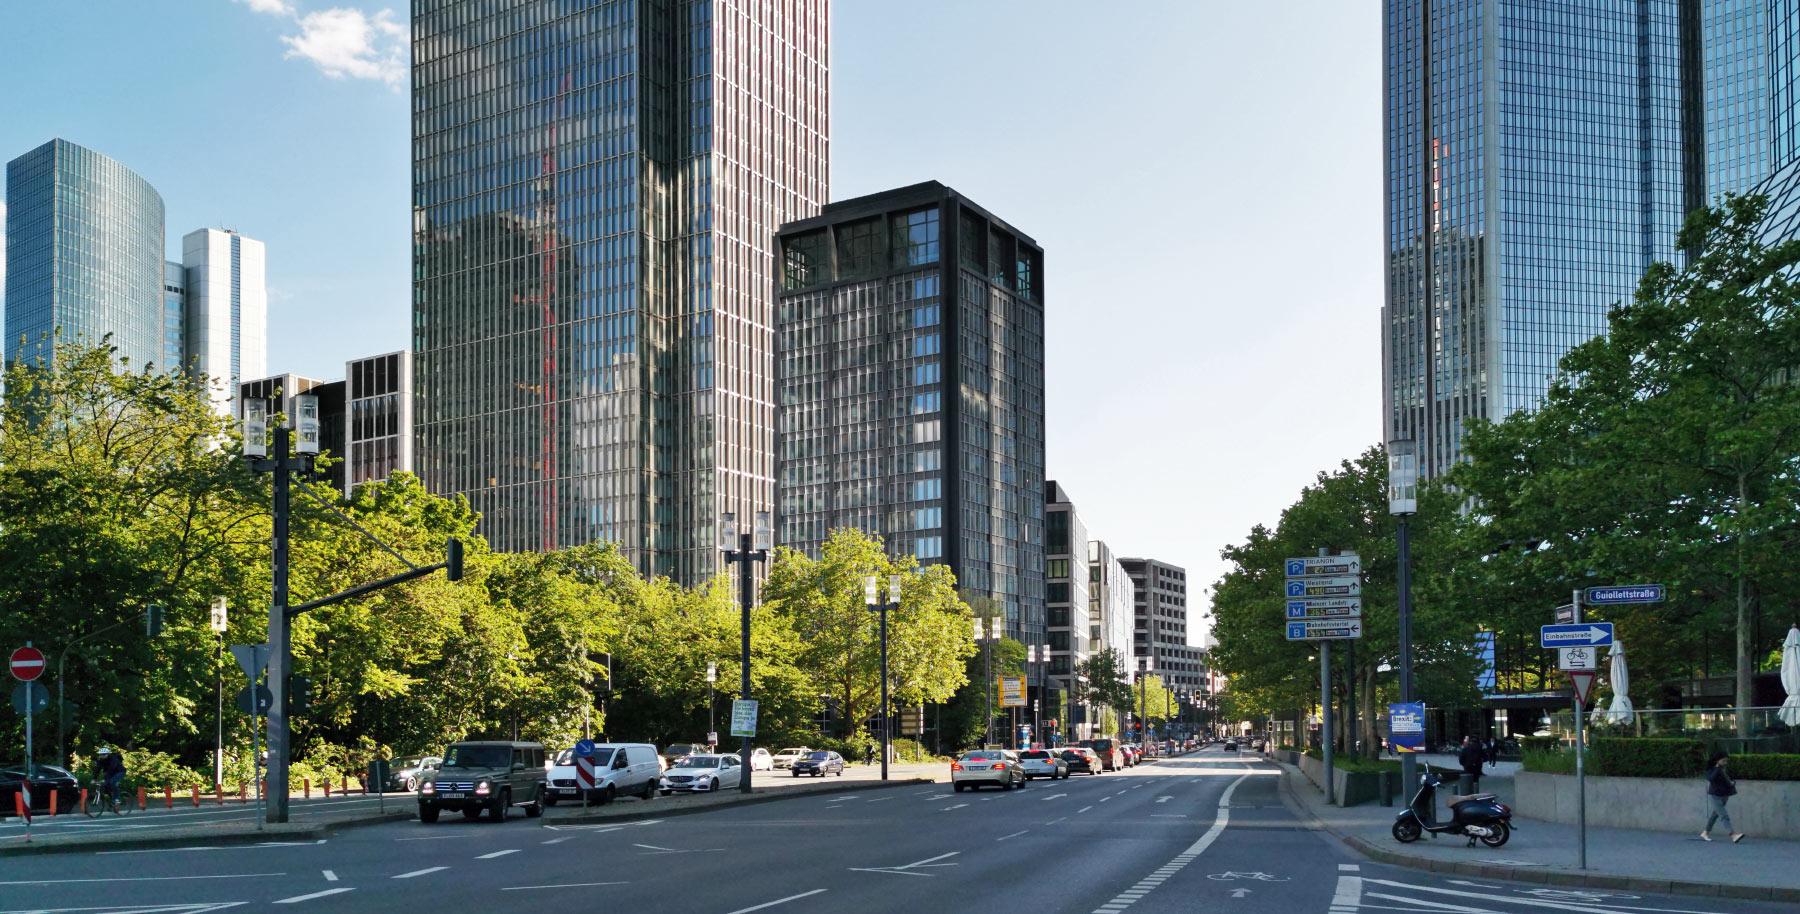 Taunusanlage 11 in Frankfurt 1m Main - T11 Frankfurt - Gleiss Lutz Frankfurt Hauptsitz